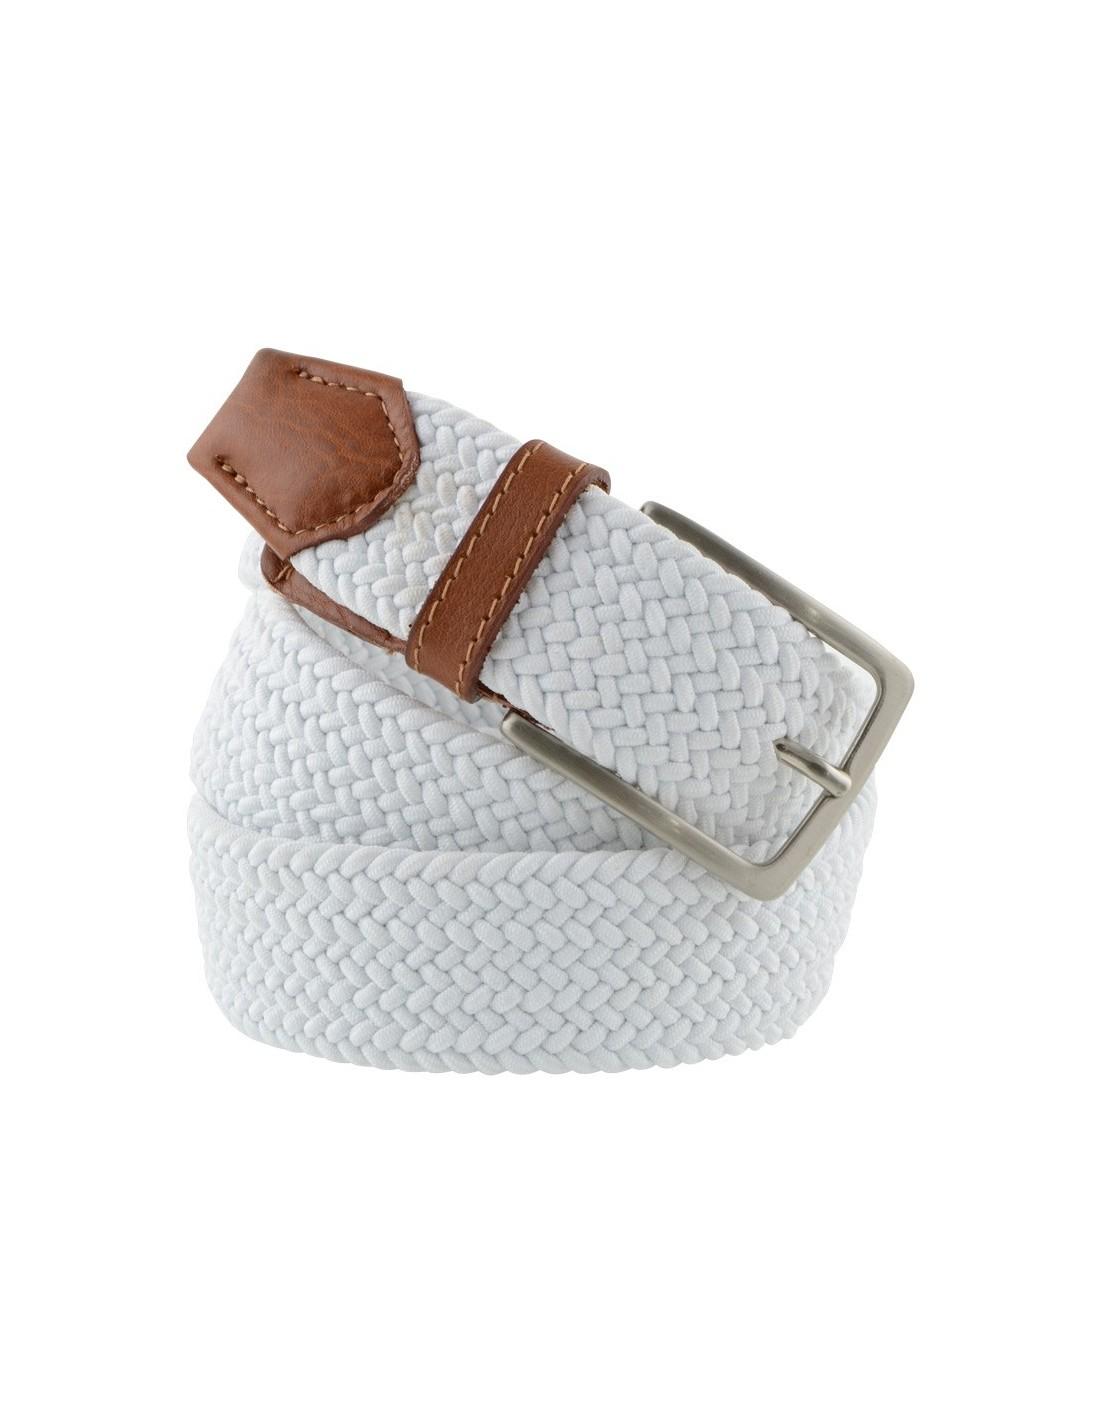 più foto e17c3 b67eb Cintura elastica da uomo intrecciata bianca